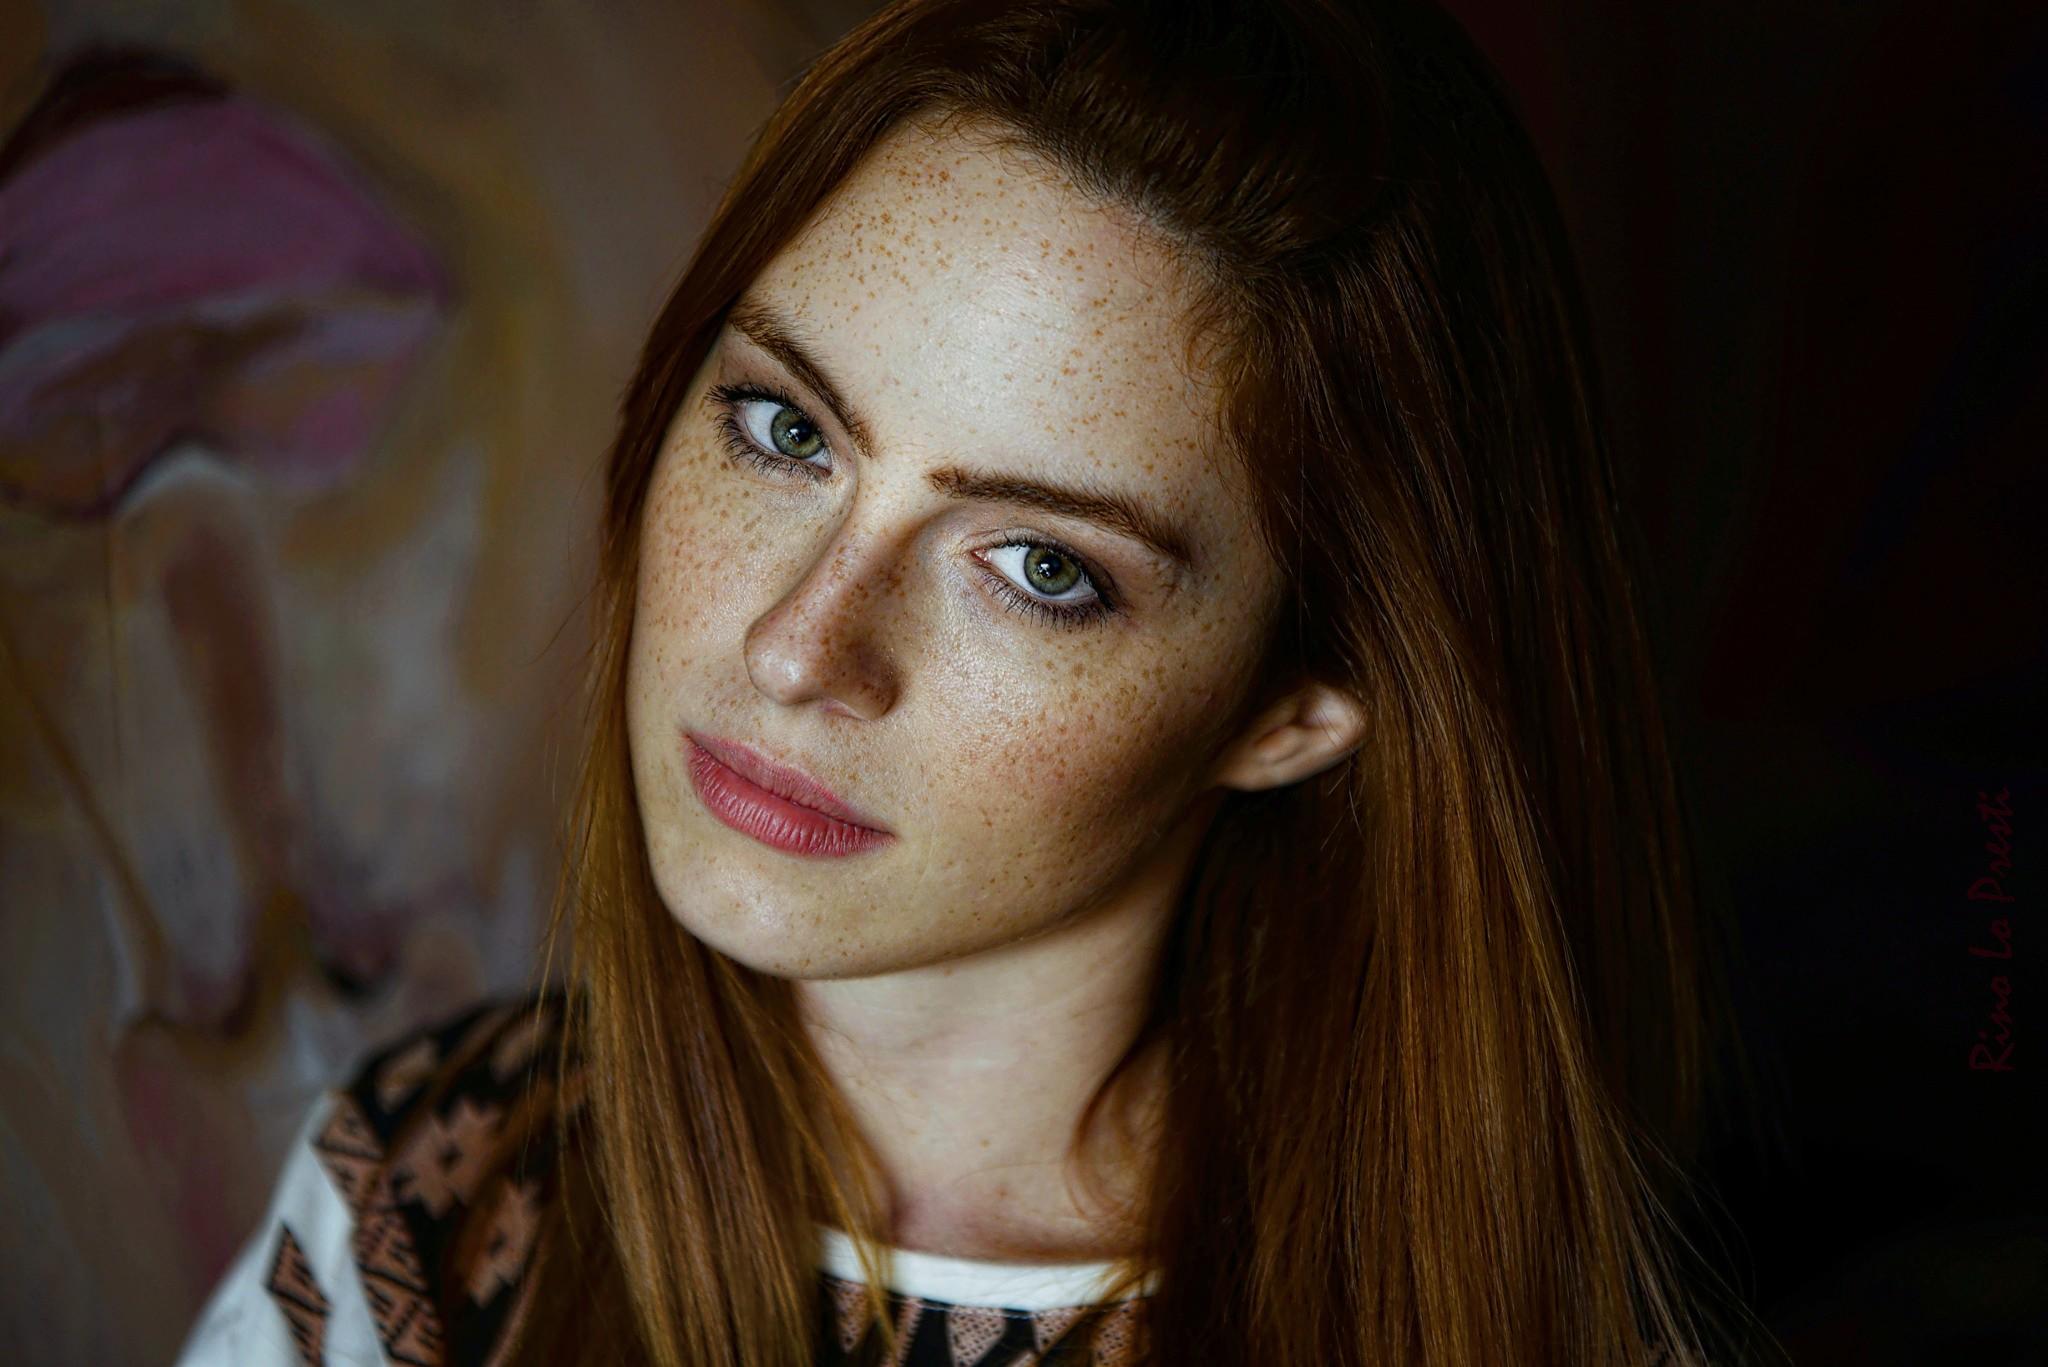 Wallpaper Face Women Model Brunette Singer Blue: Papel De Parede : Cara, Mulheres, Modelo, Olhos Verdes